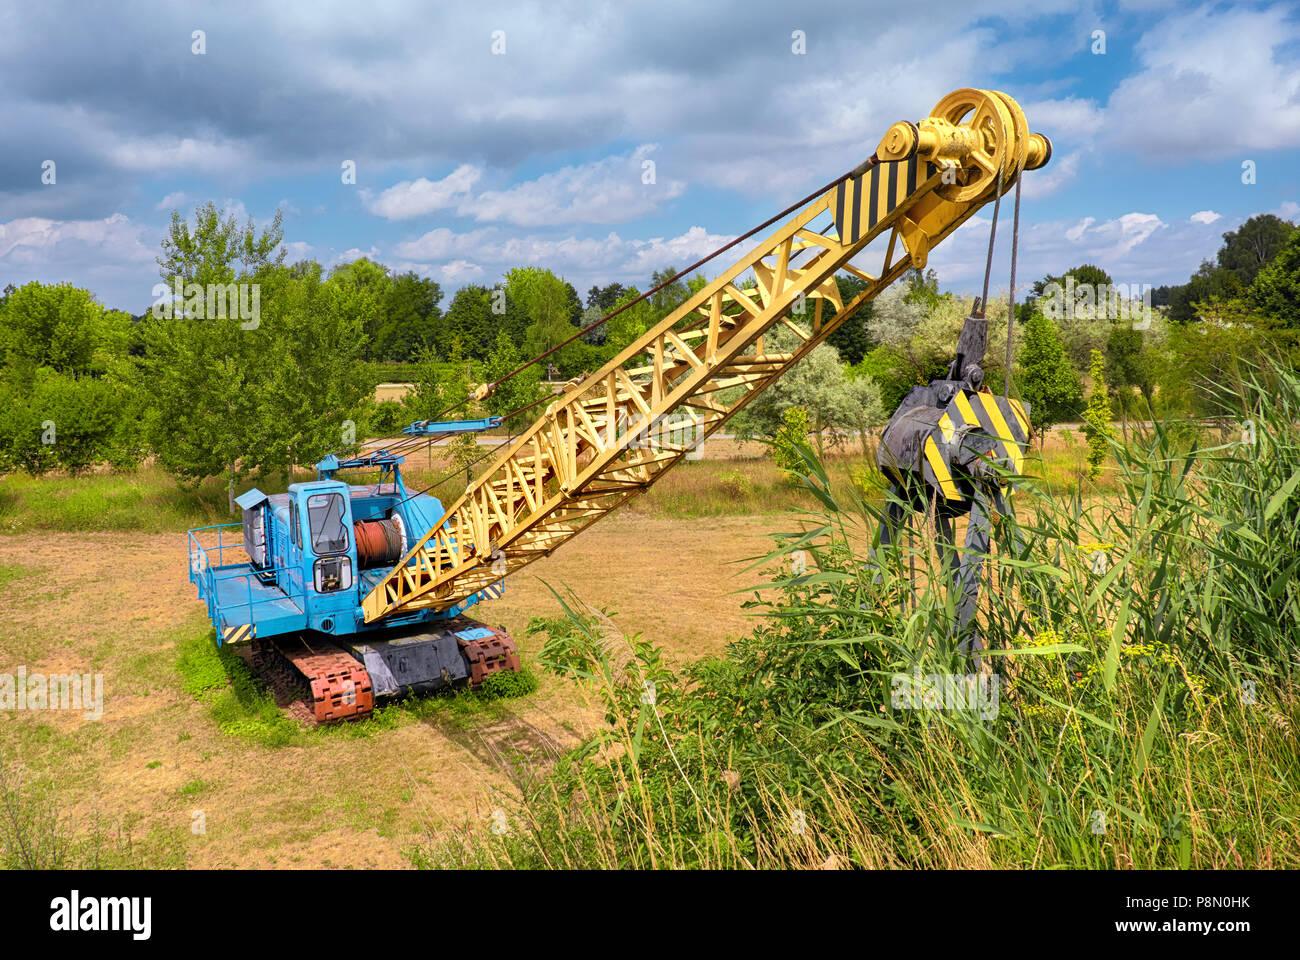 Old German dragline excavator used for open pit coal mining in Brandenburg, Germany Stock Photo